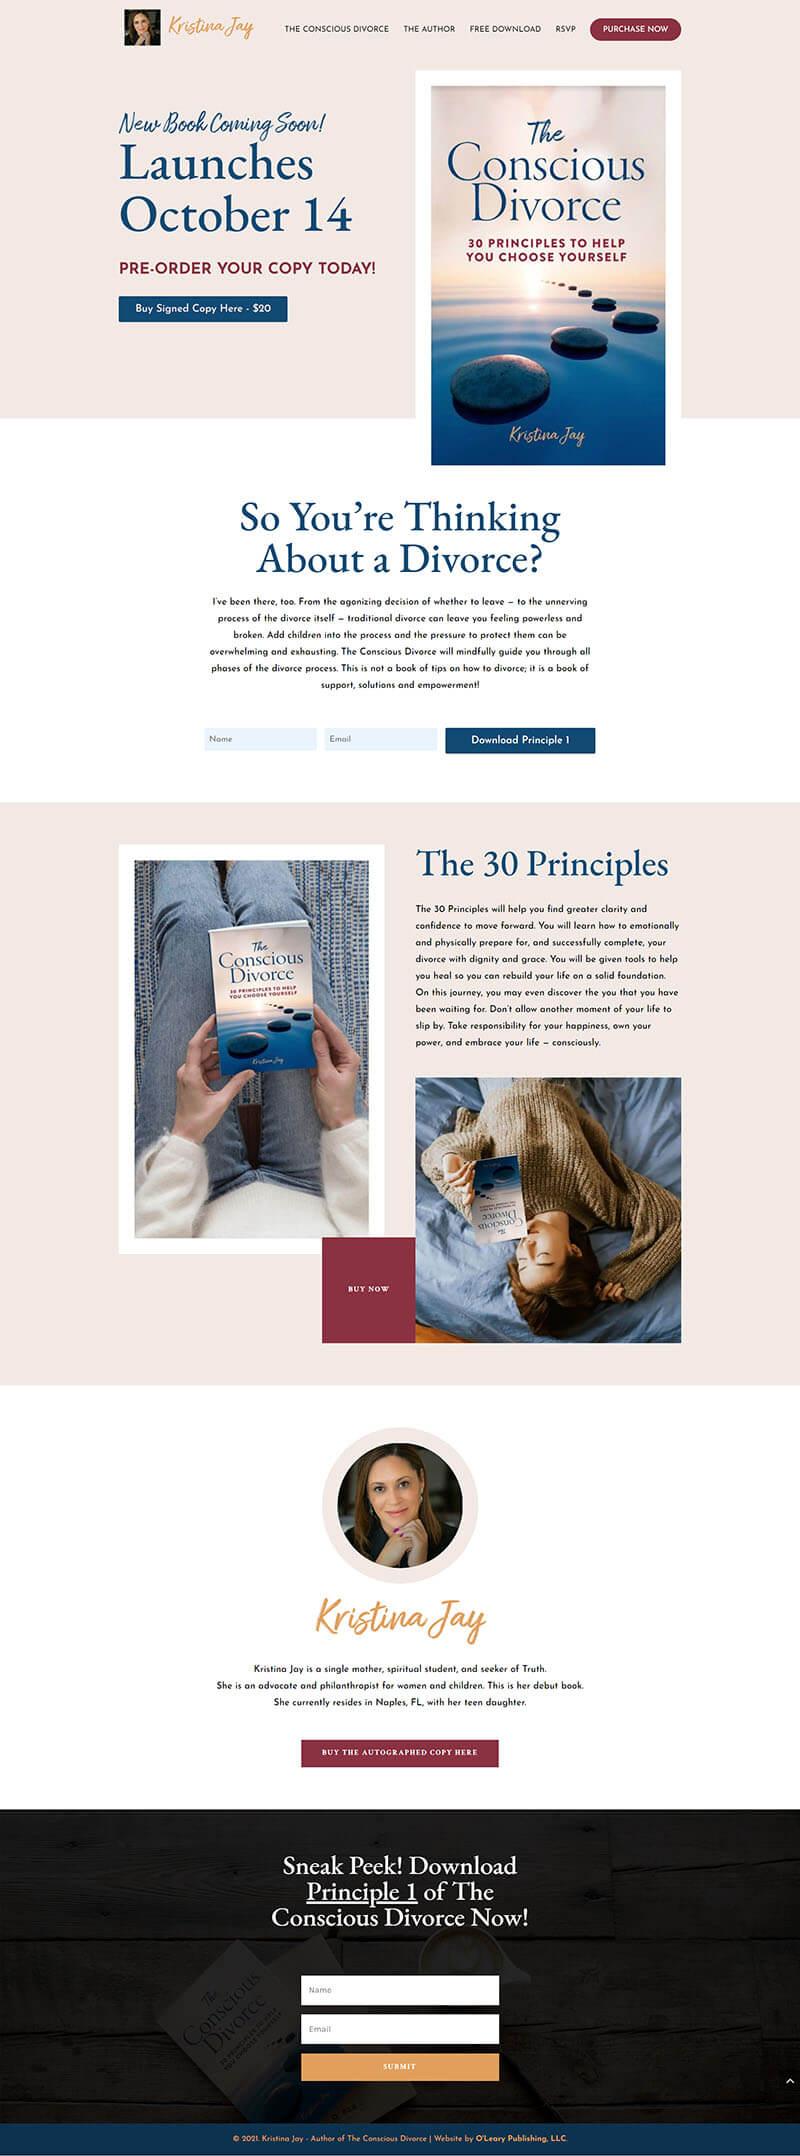 Kristina Jay homepage